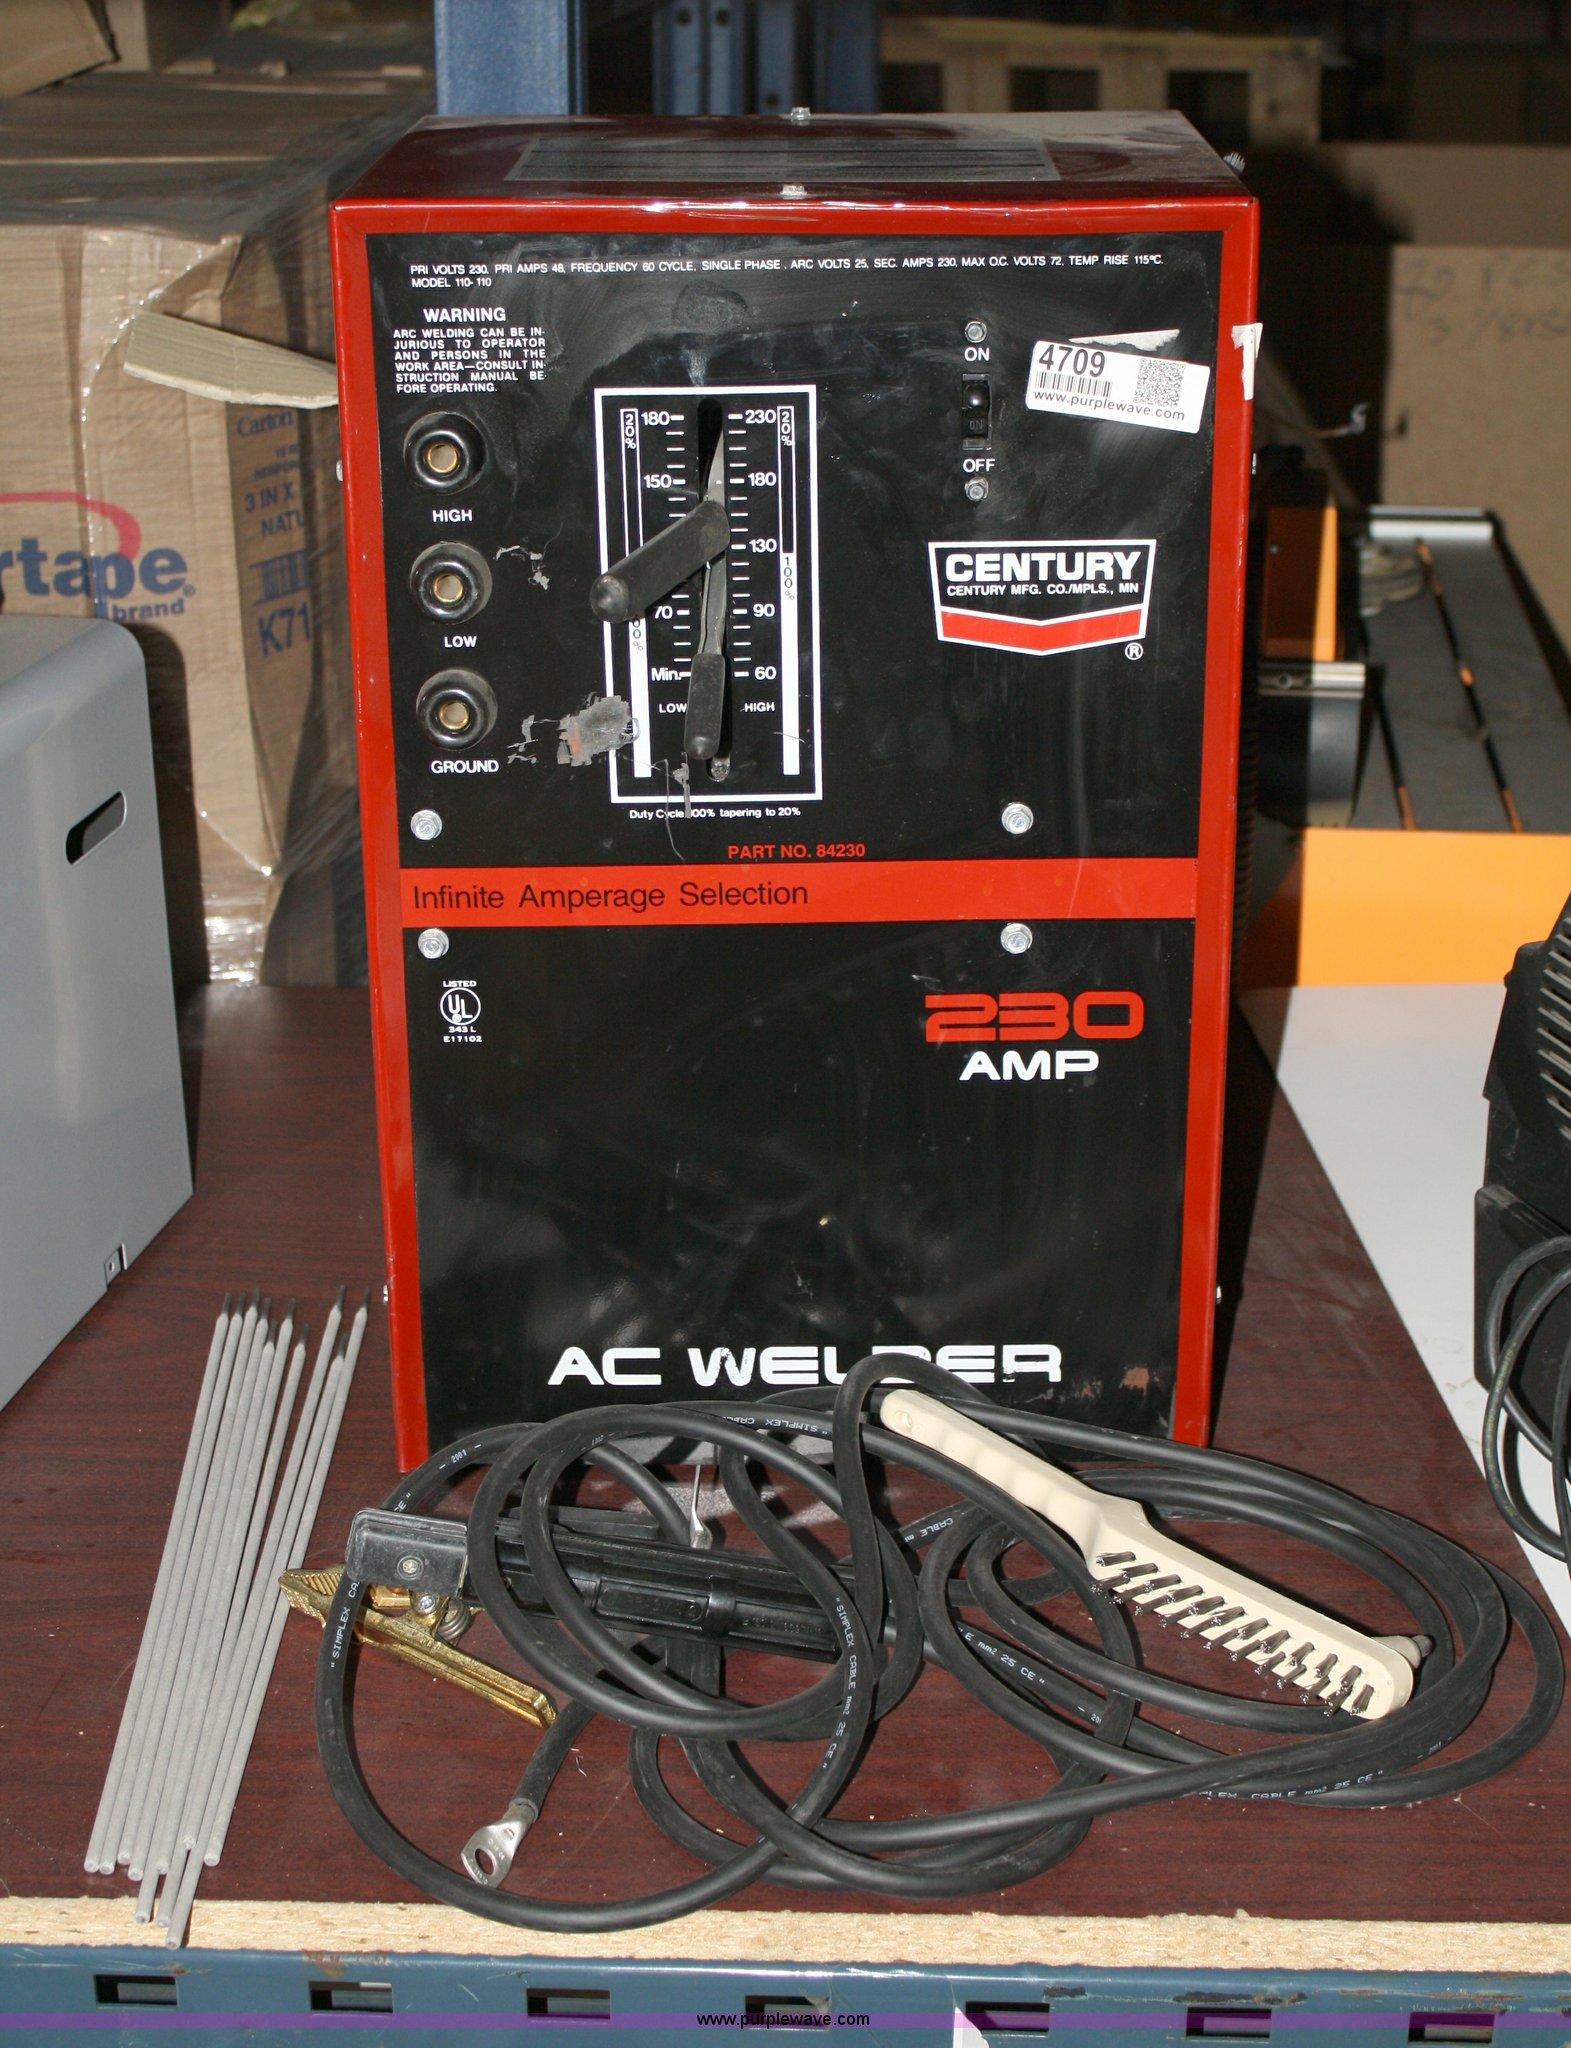 Century 230 amp arc welder | Item 4709 | SOLD! April 5 TAP E